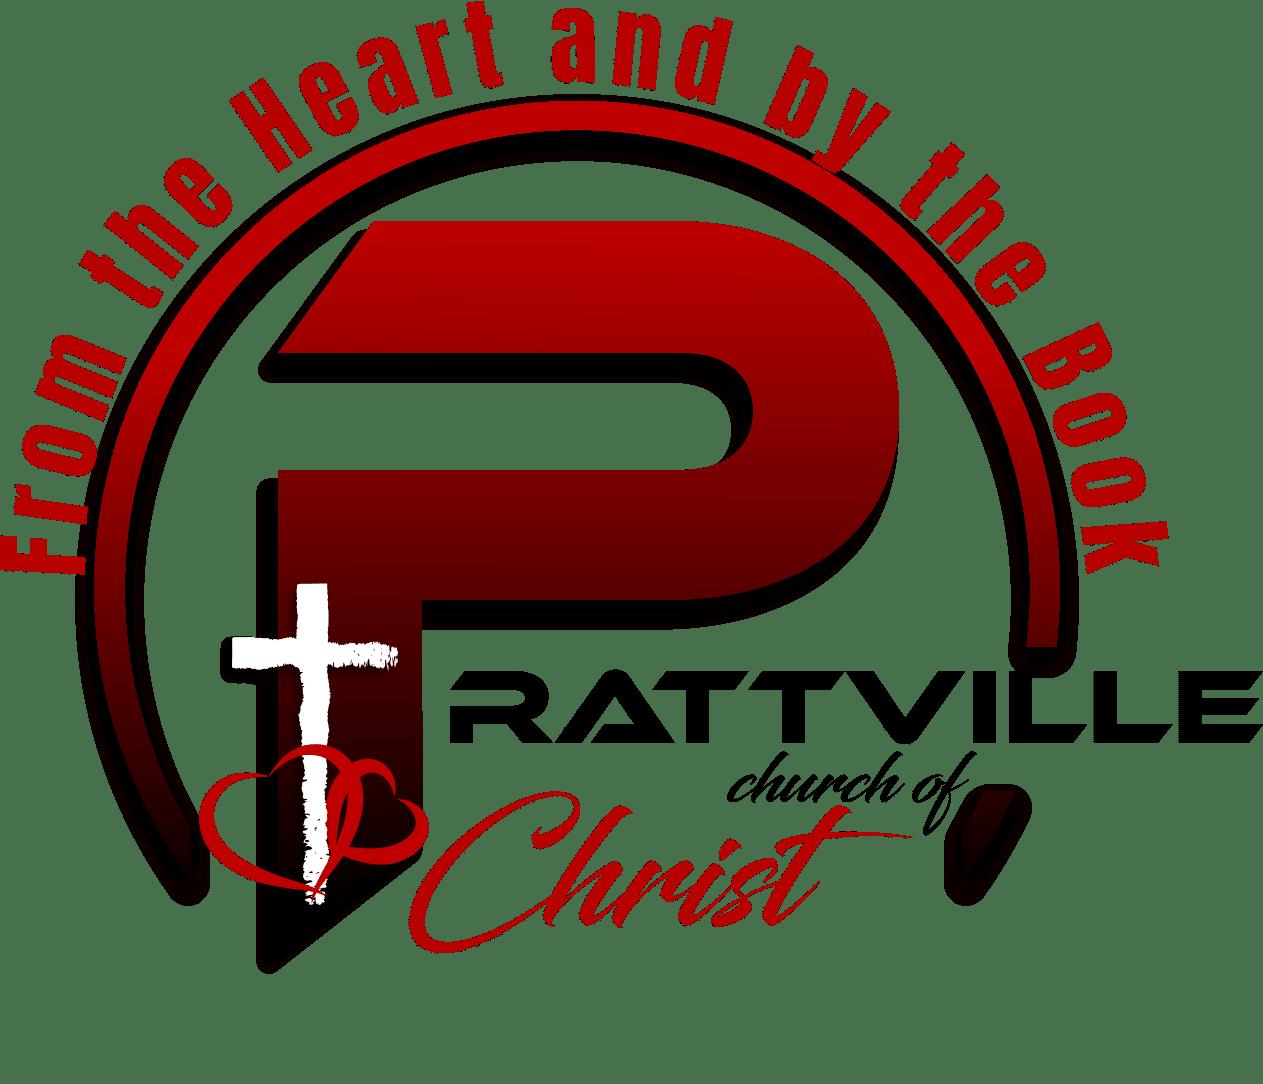 Prattville Church of Christ